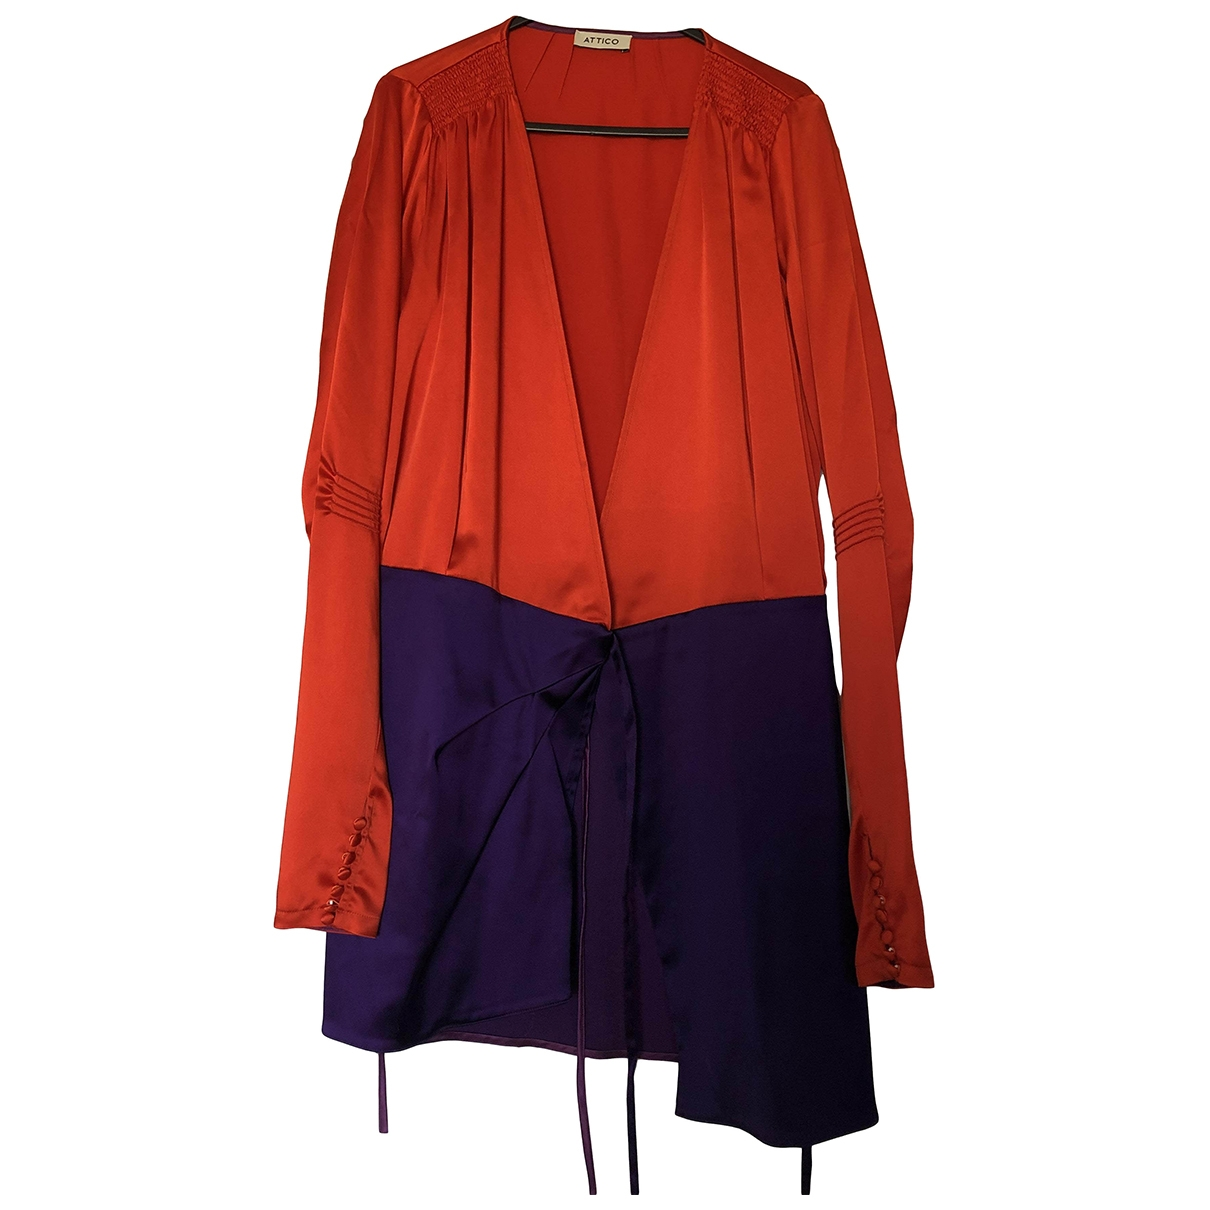 Attico \N Red dress for Women 0 0-5